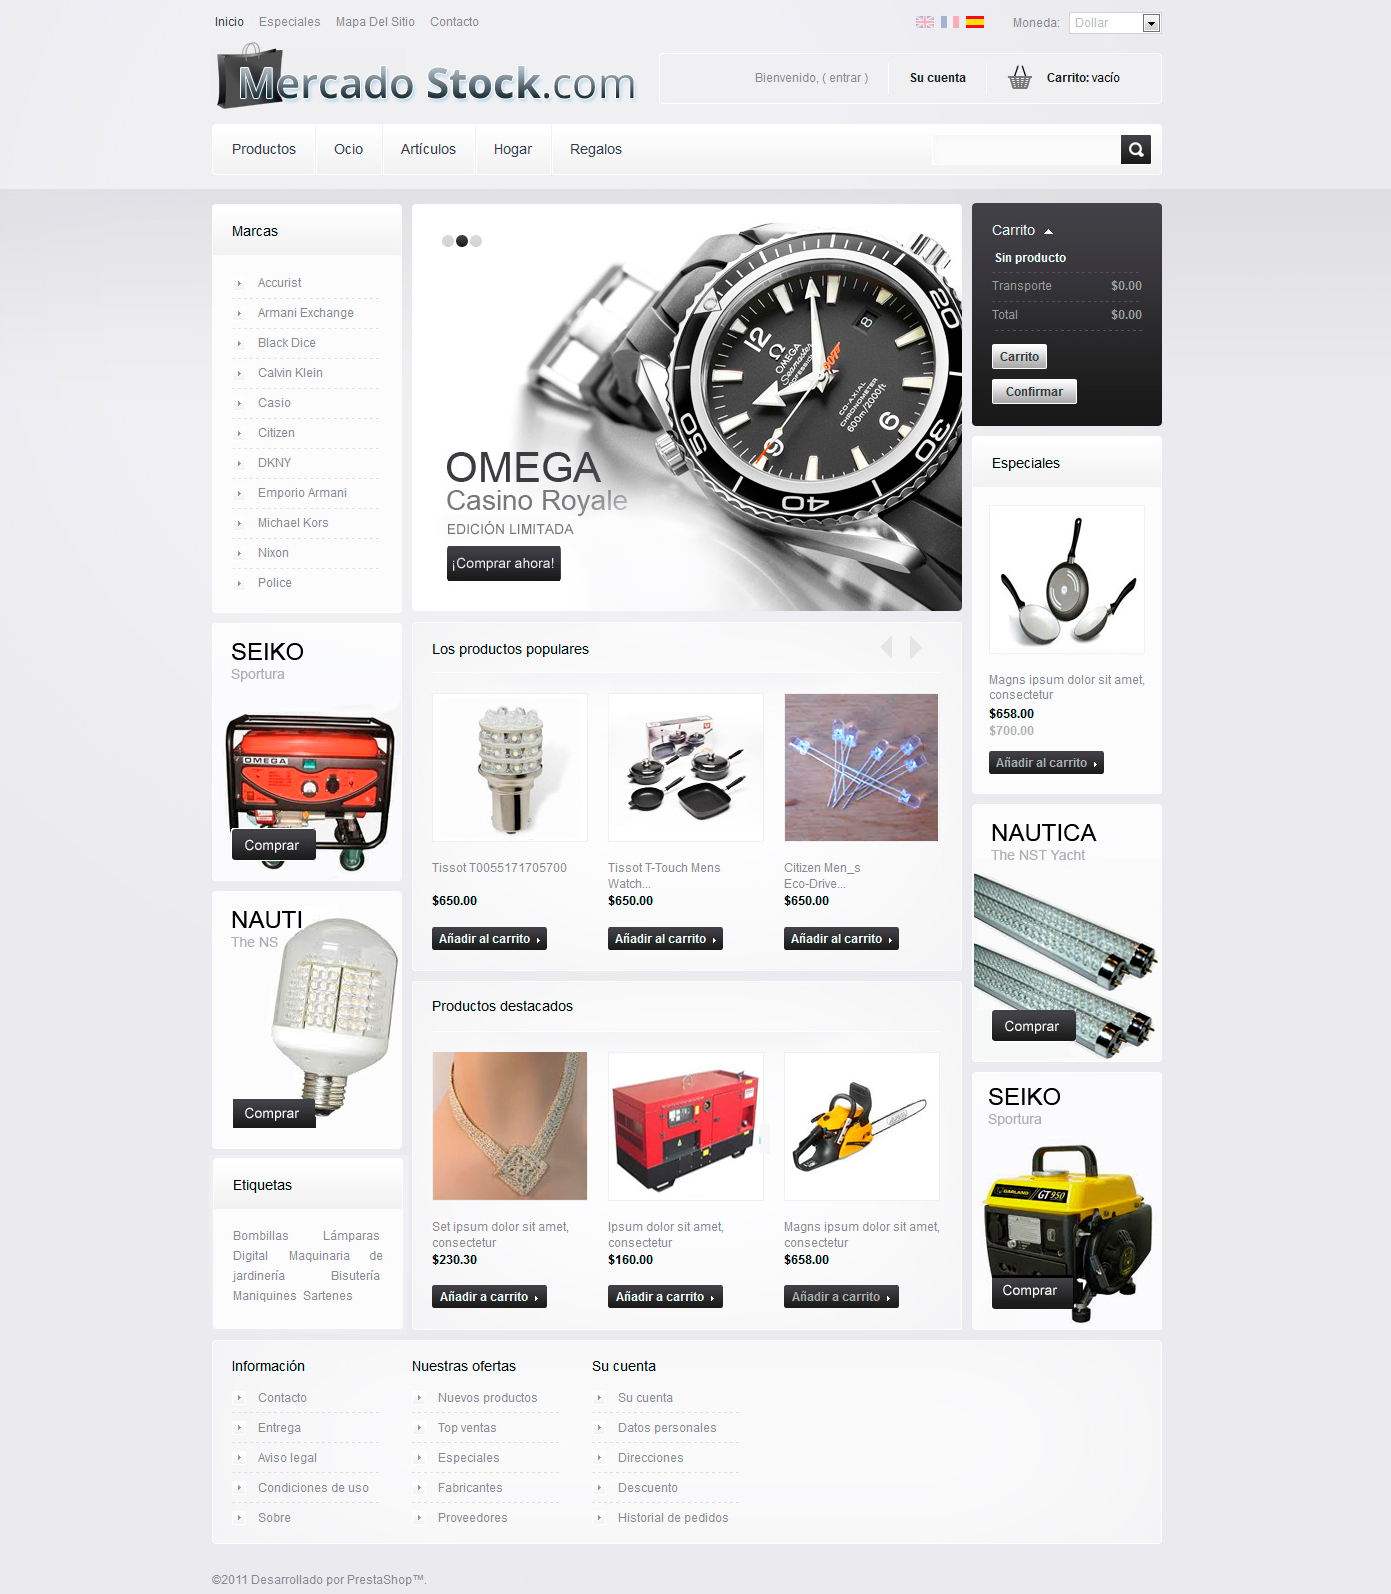 Tienda online Mercadostock